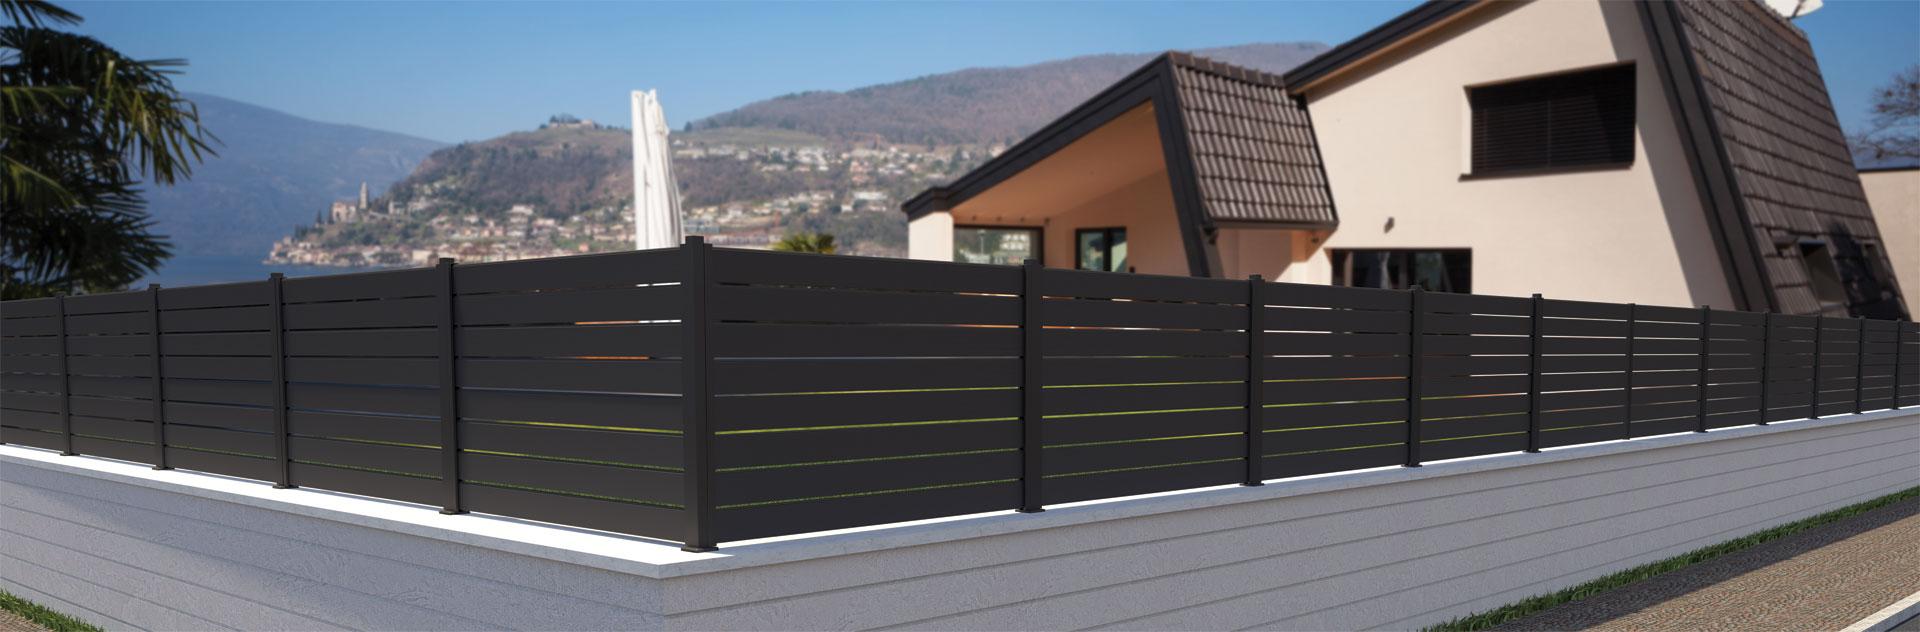 Eko dvorišne aluminijumske ograde